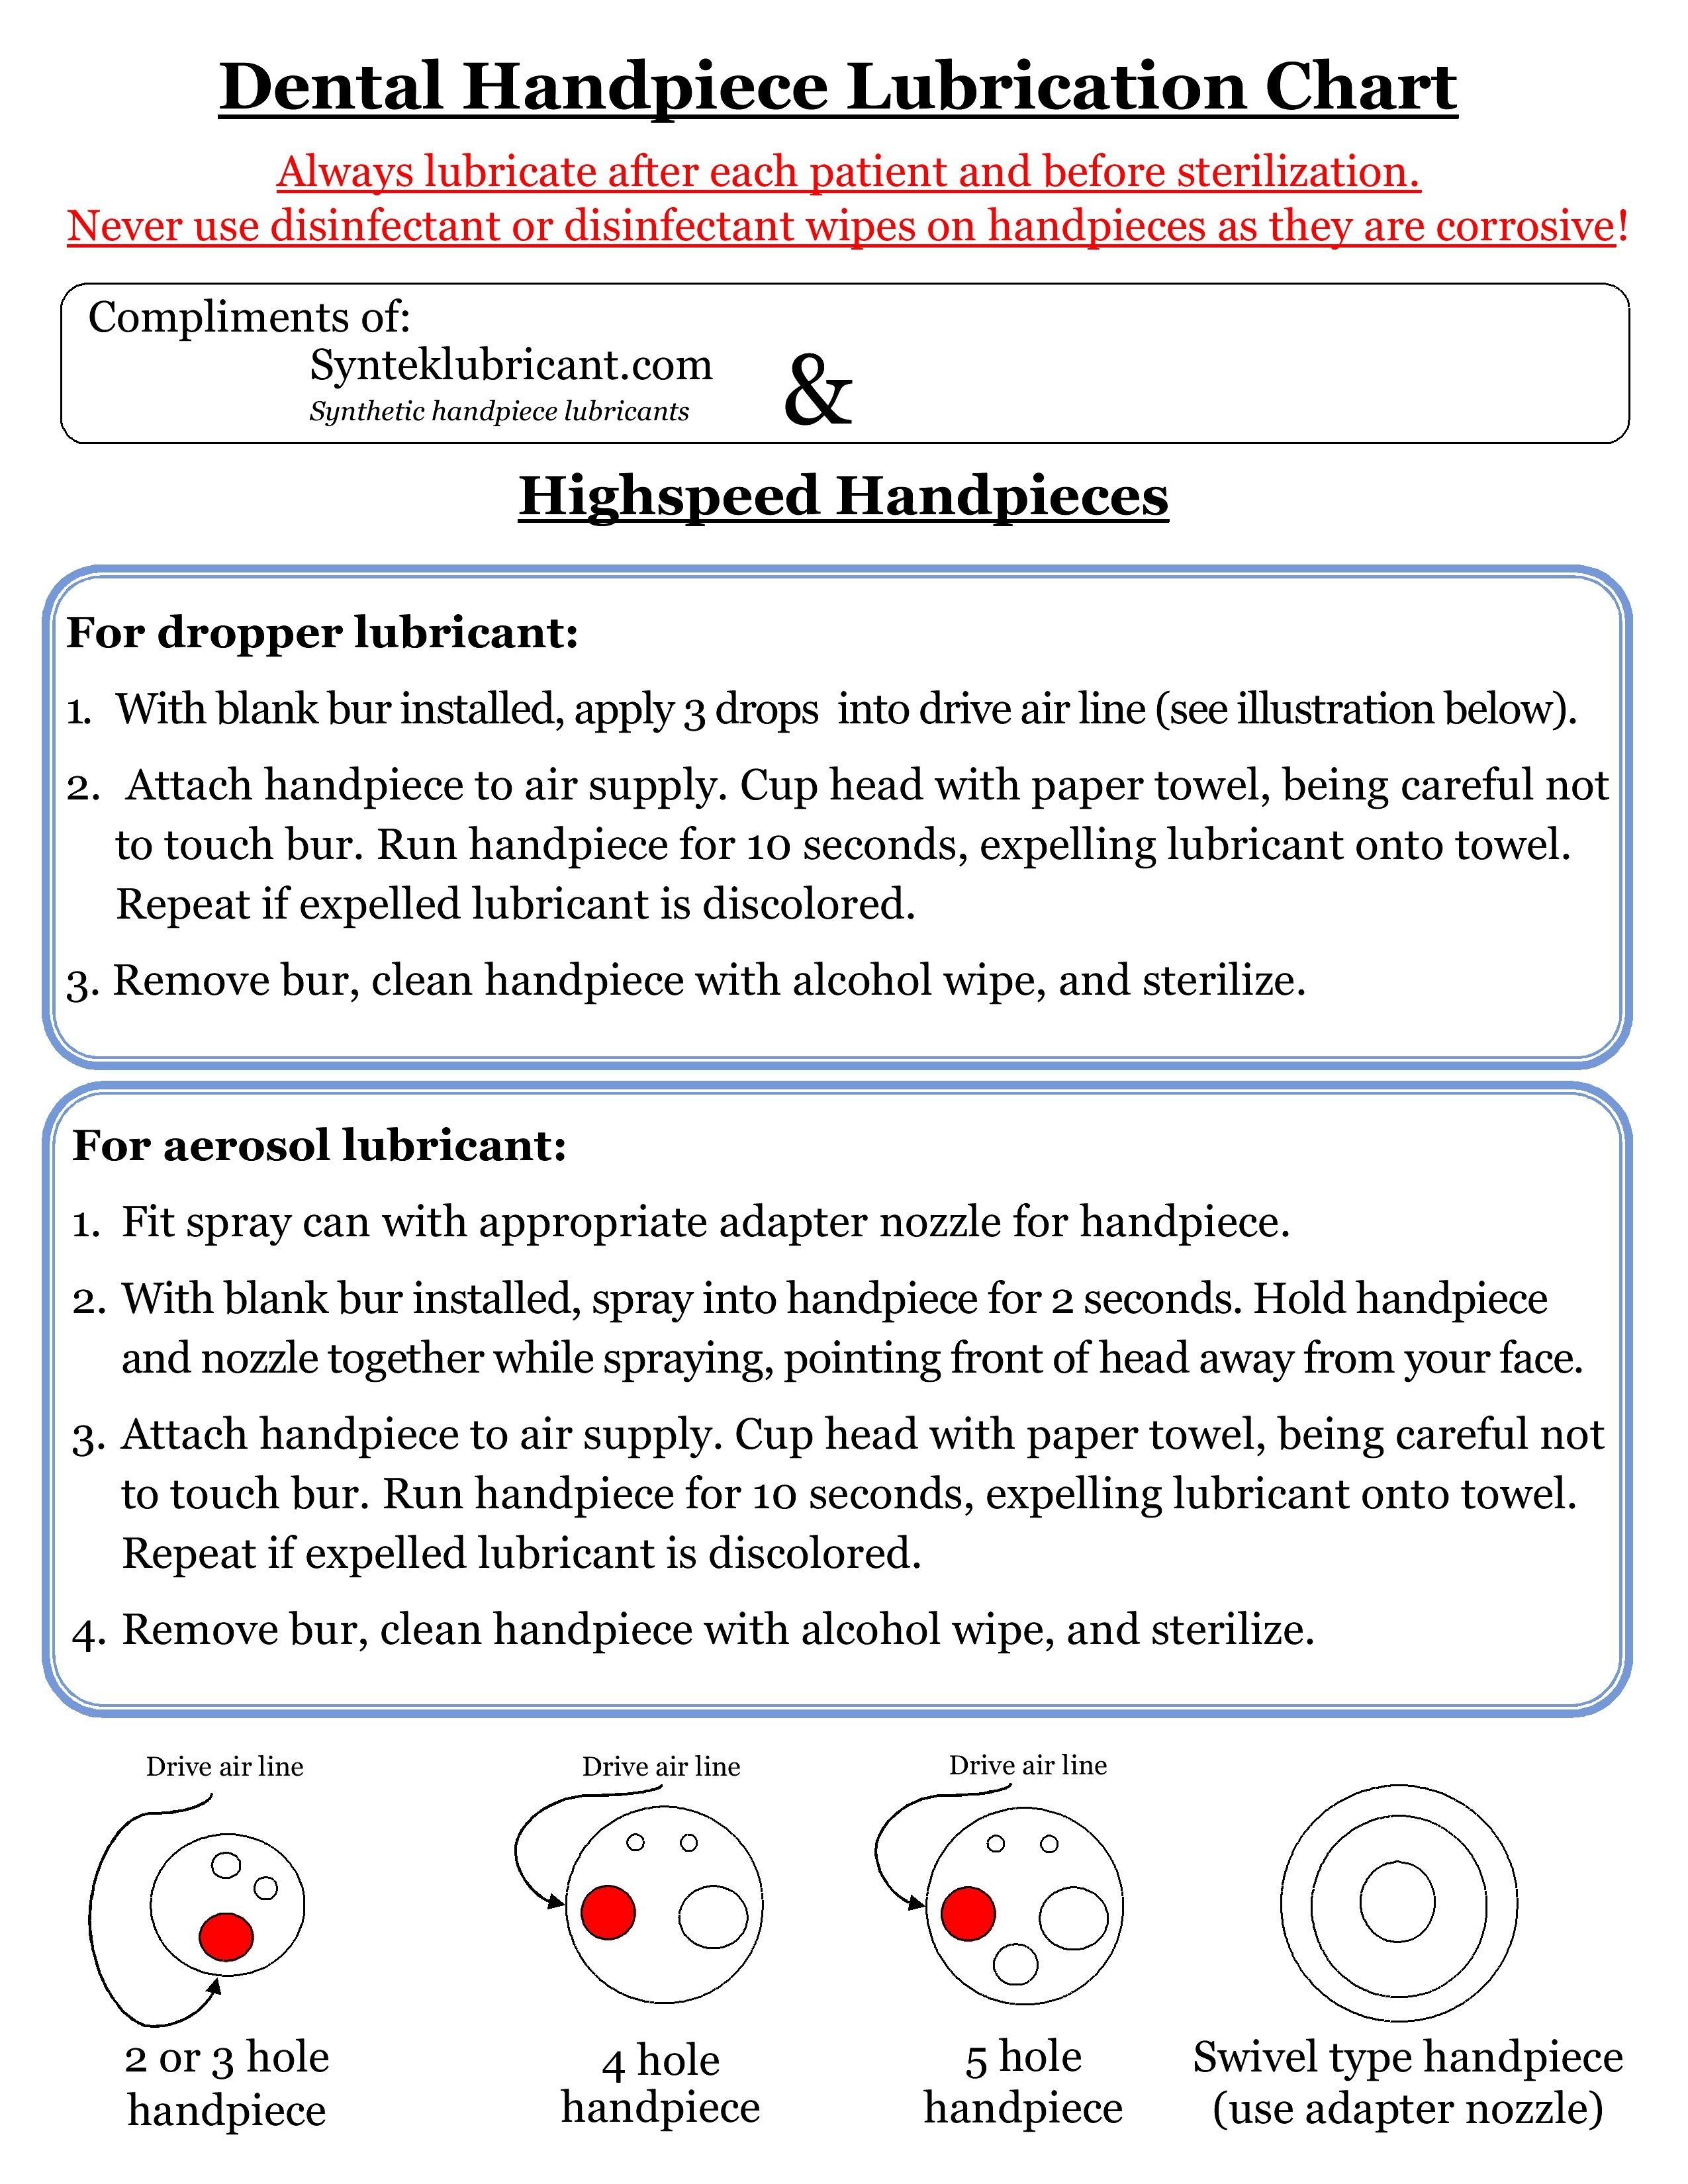 handpiece-lubrication-chart-2-001.jpg